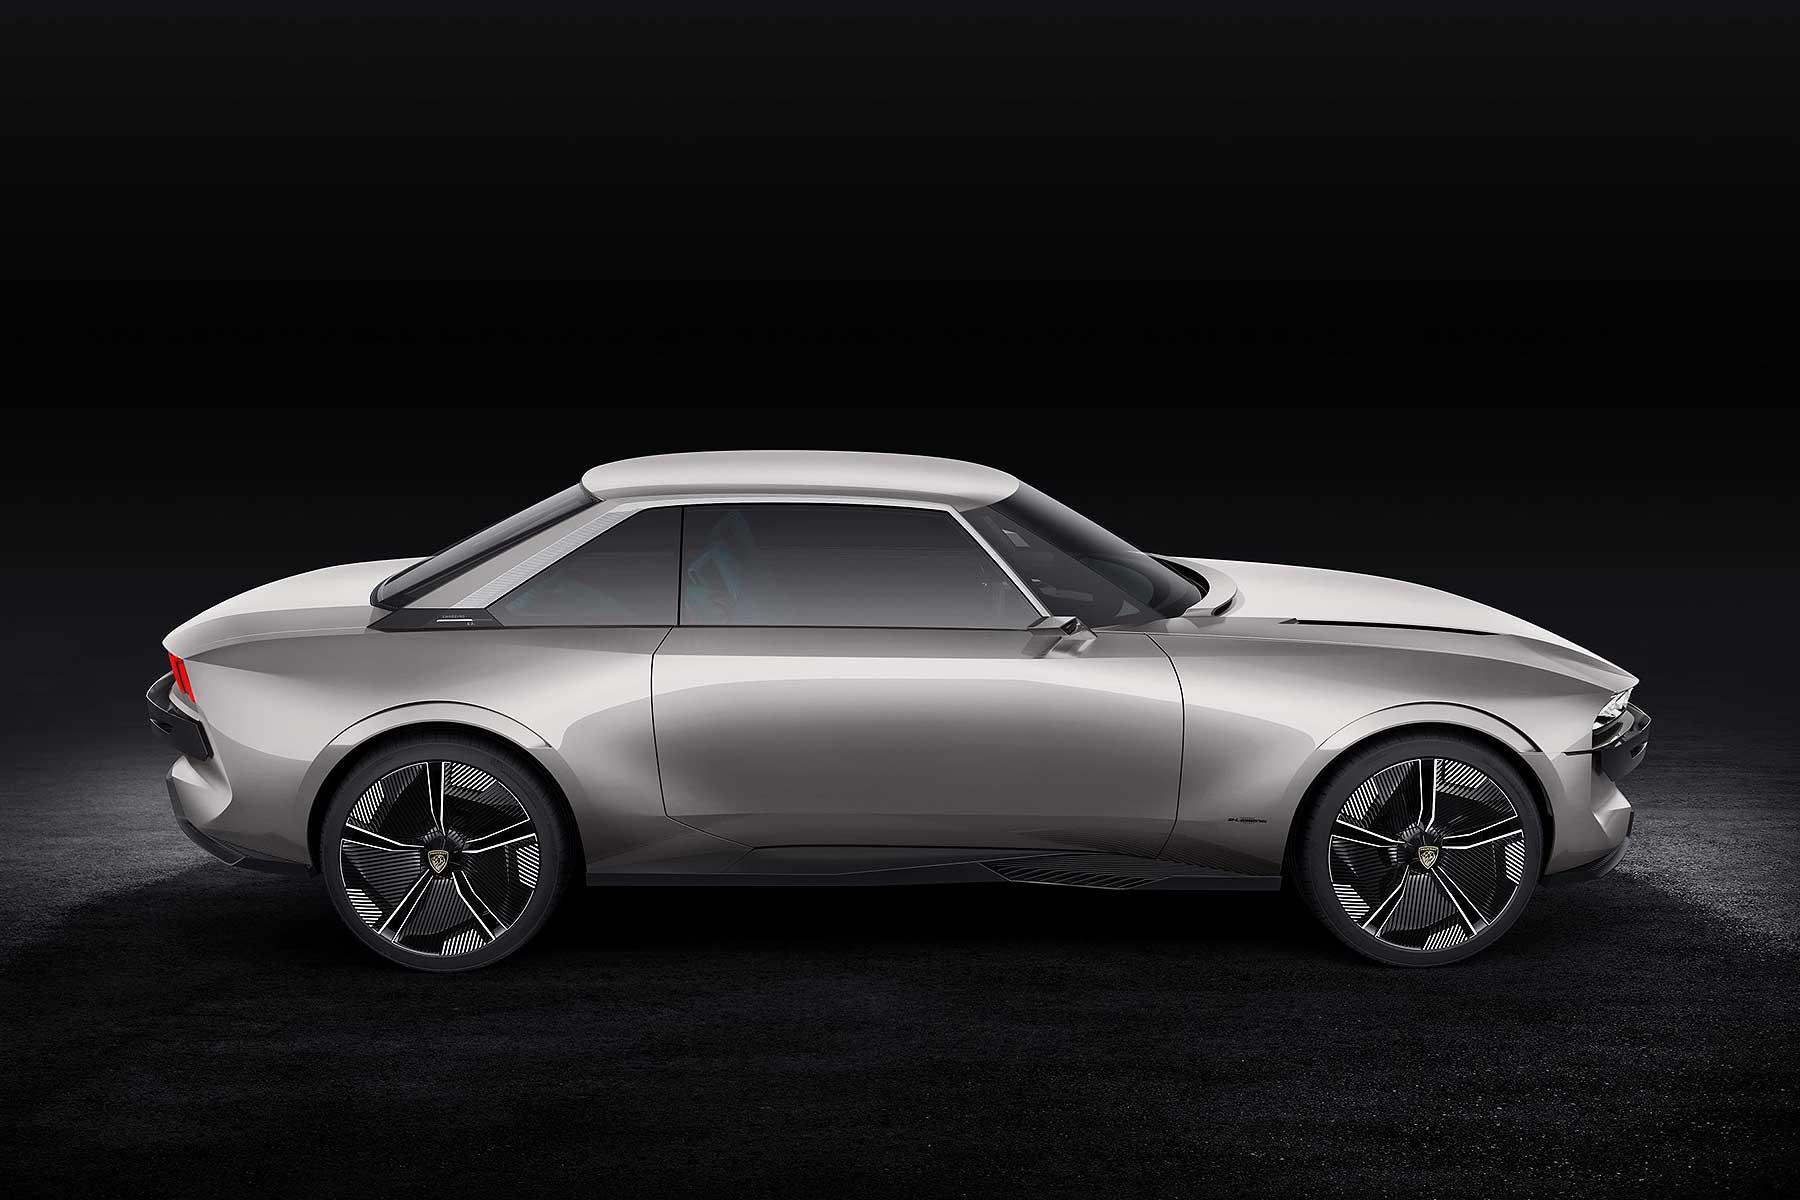 https://www.motoringresearch.com/wp-content/uploads/2018/09/Peugeot_e-Legend_Concept_04.jpg